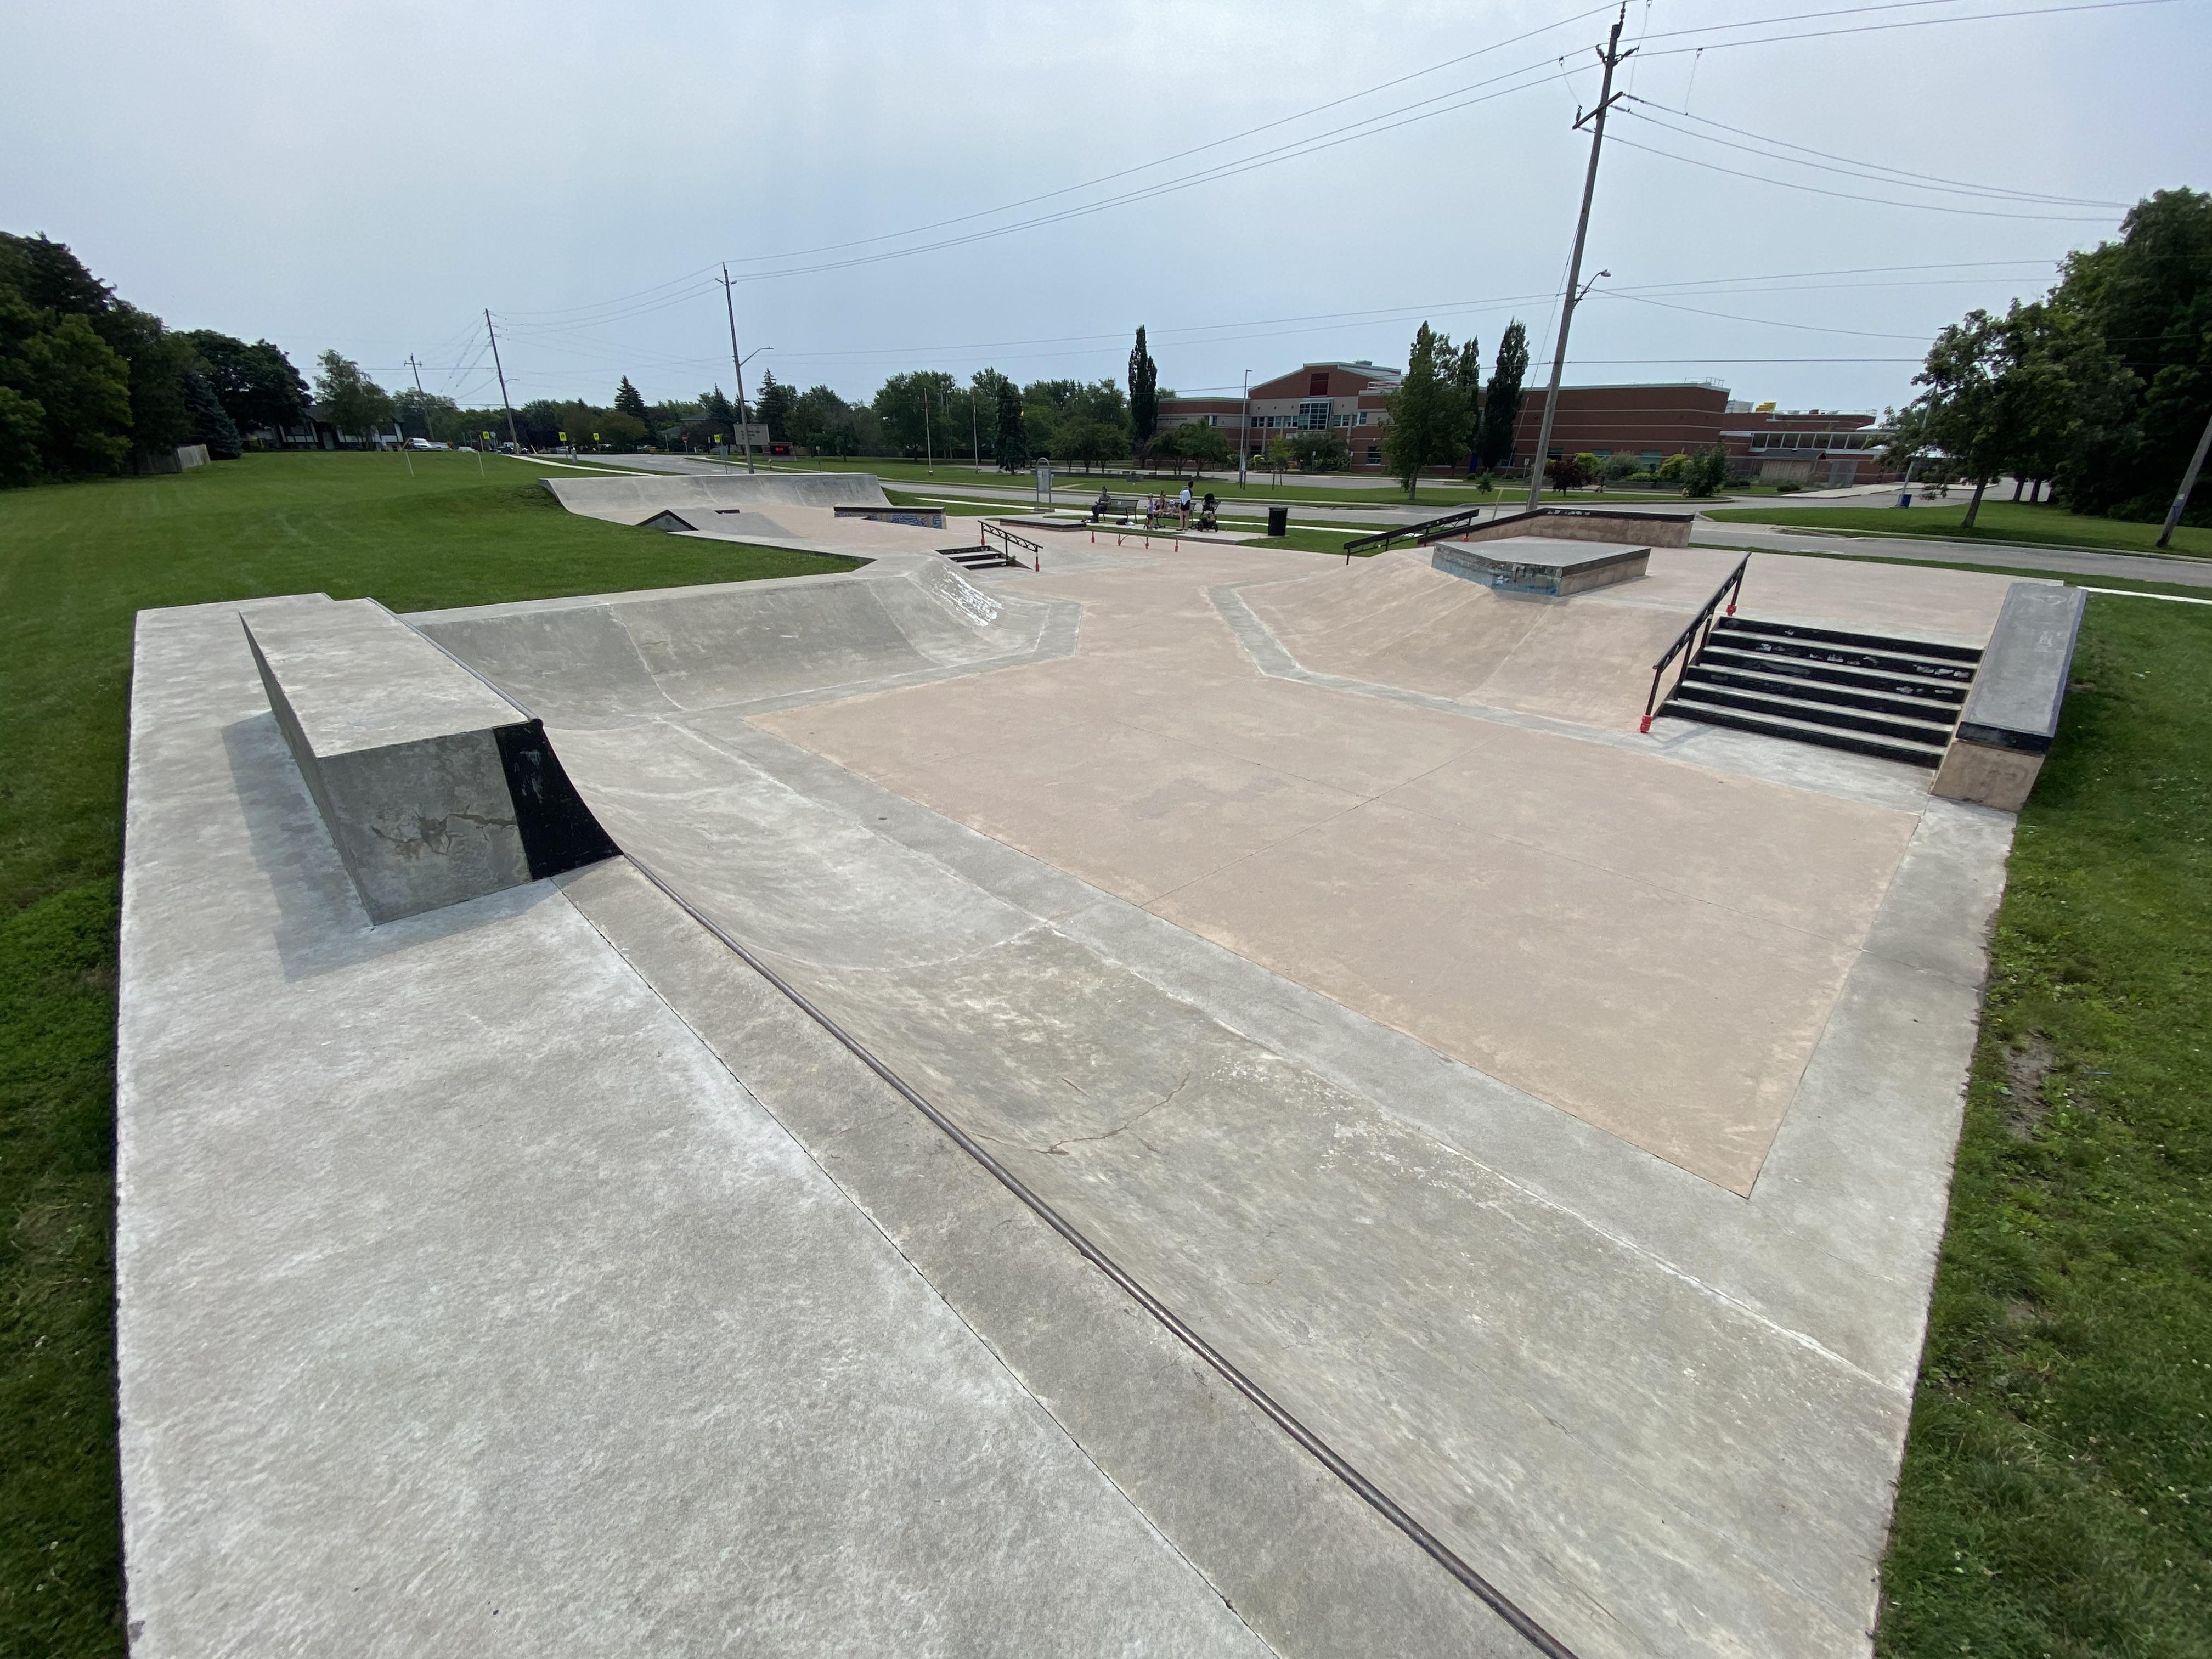 Caledonia Skatepark from the back